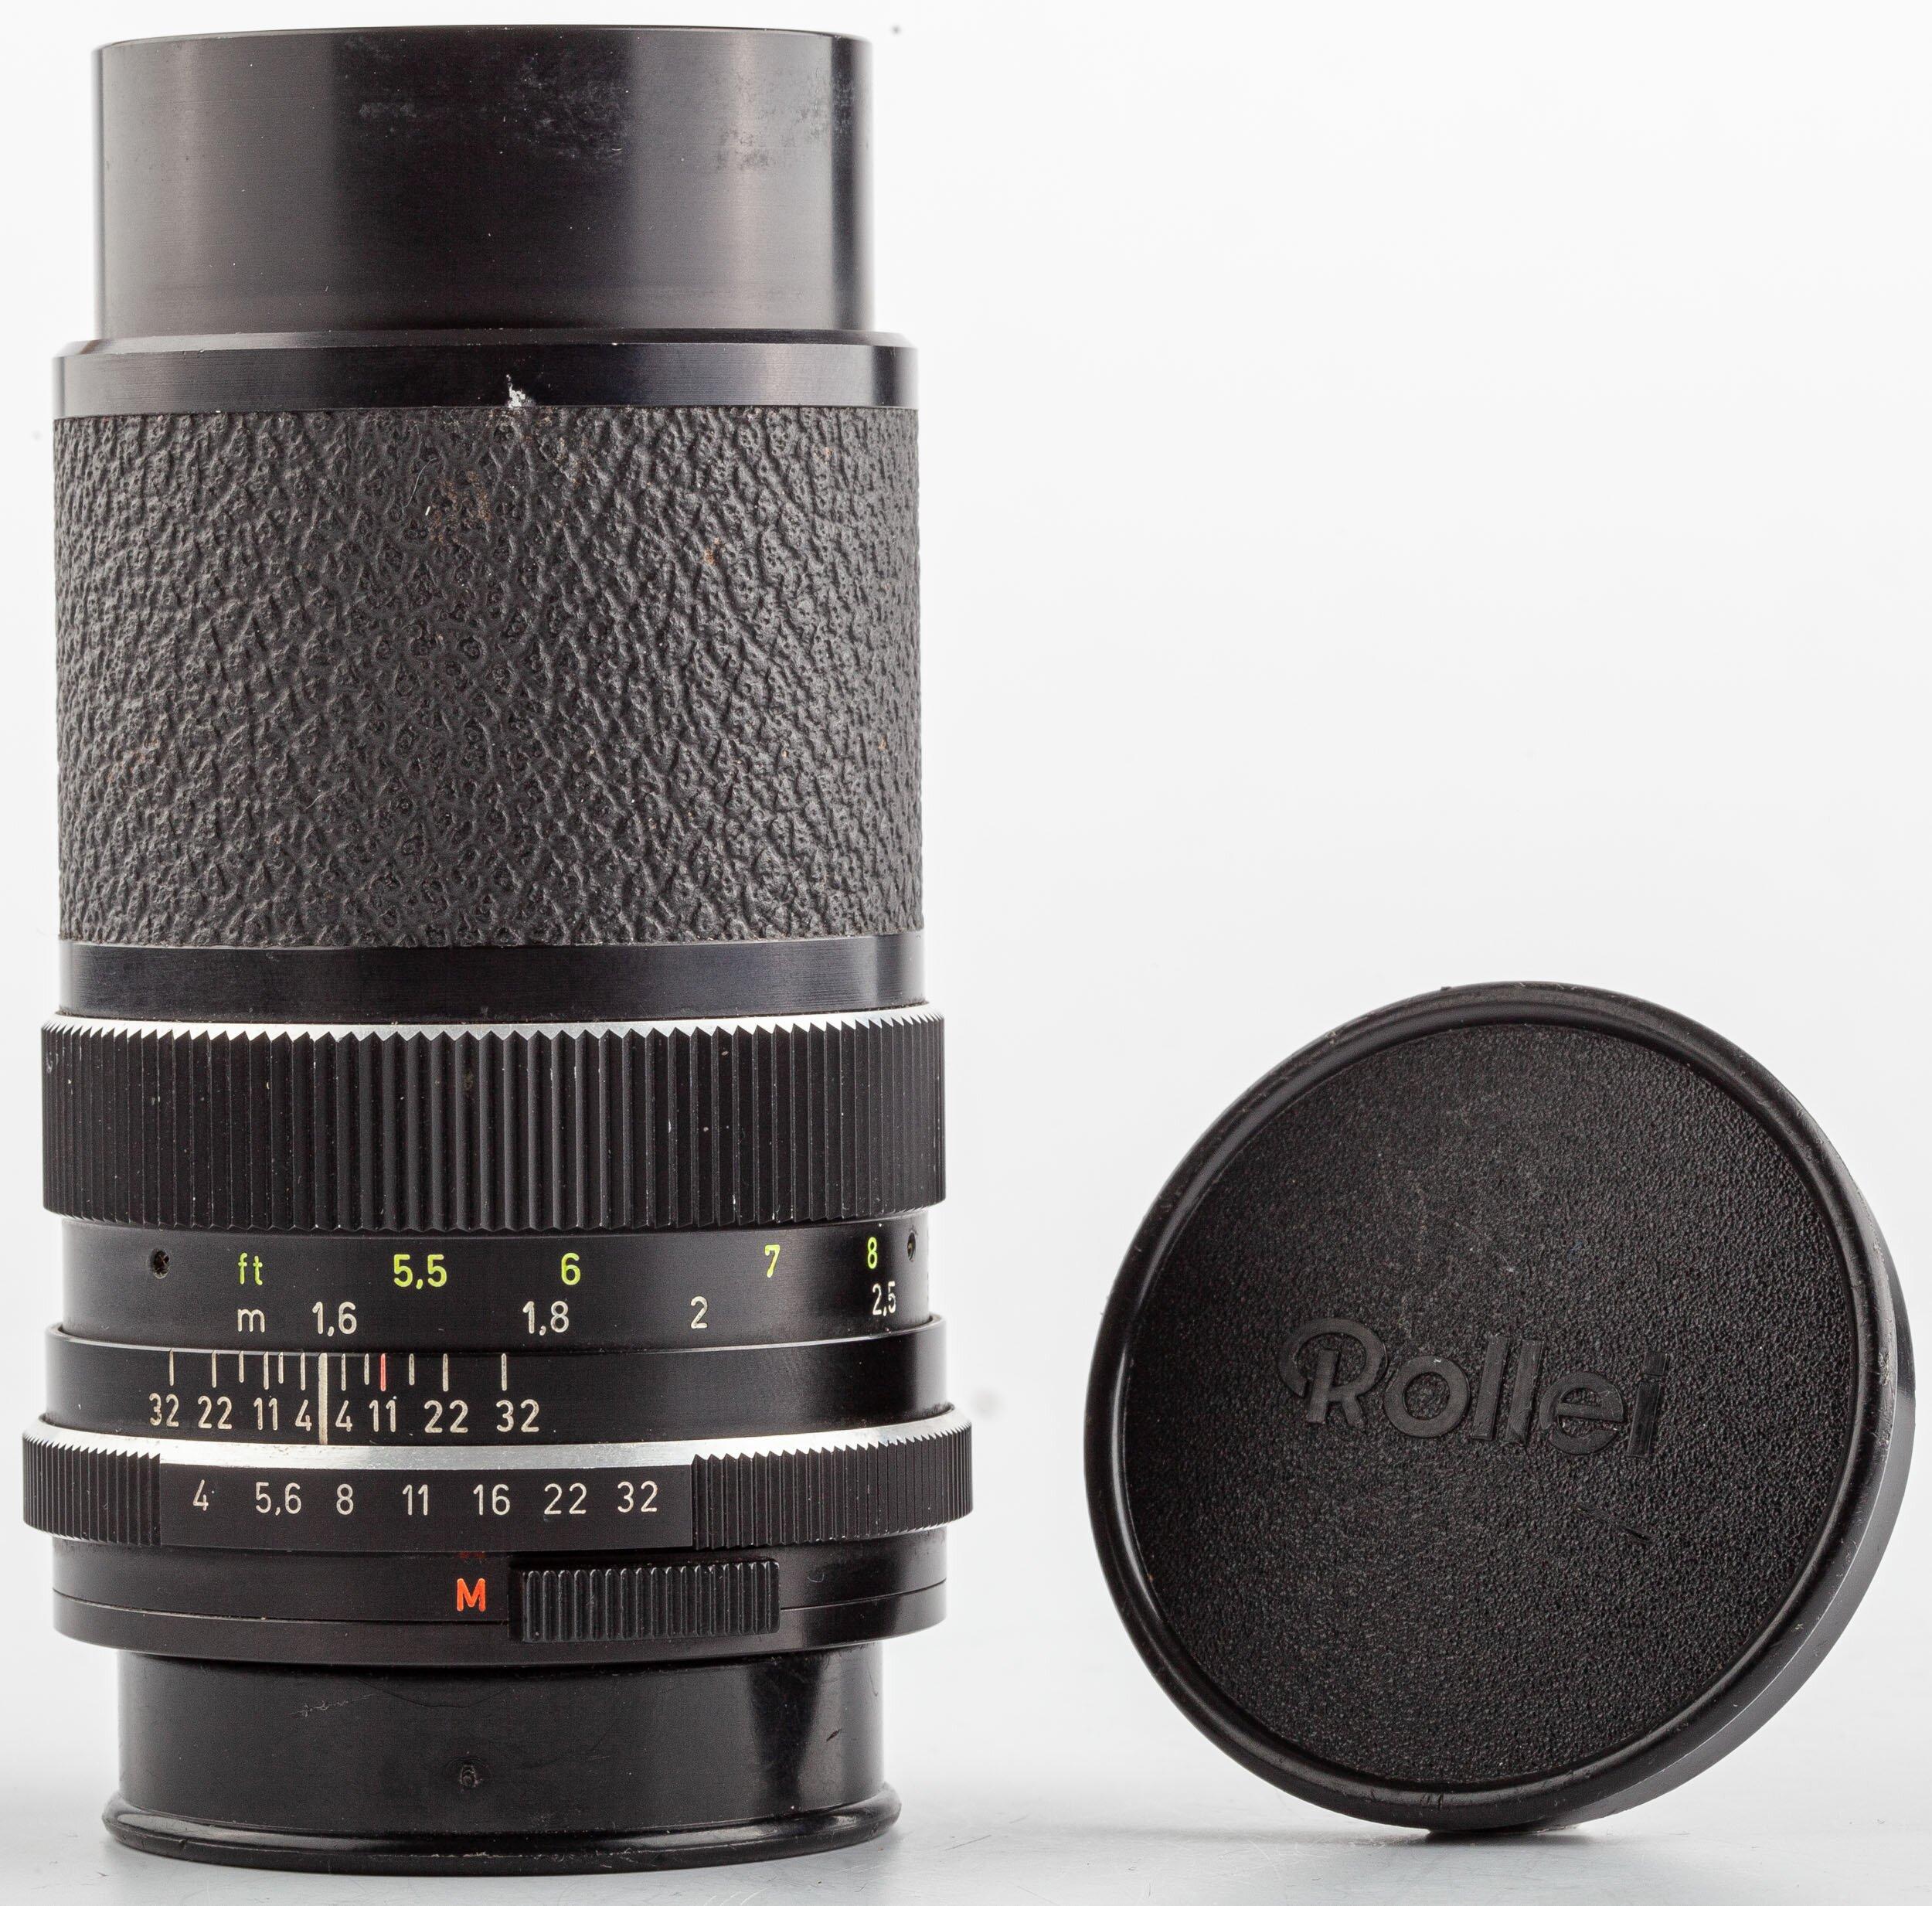 Carl Zeiss Tele-Tessar 4/135mm Rollei QBM